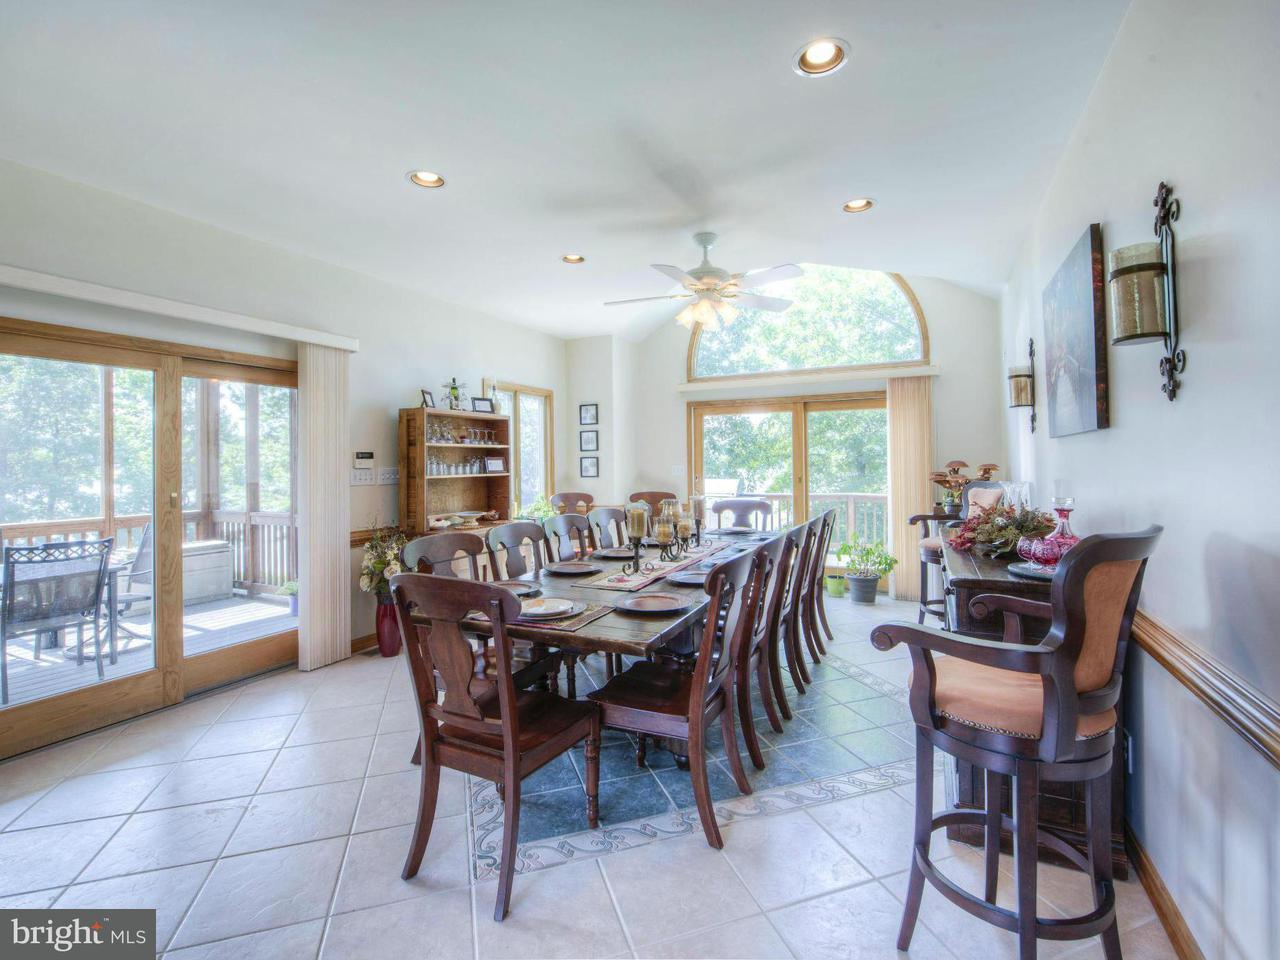 Additional photo for property listing at 9675 Kentucky Springs Road 9675 Kentucky Springs Road Mineral, Virginia 23117 Stati Uniti